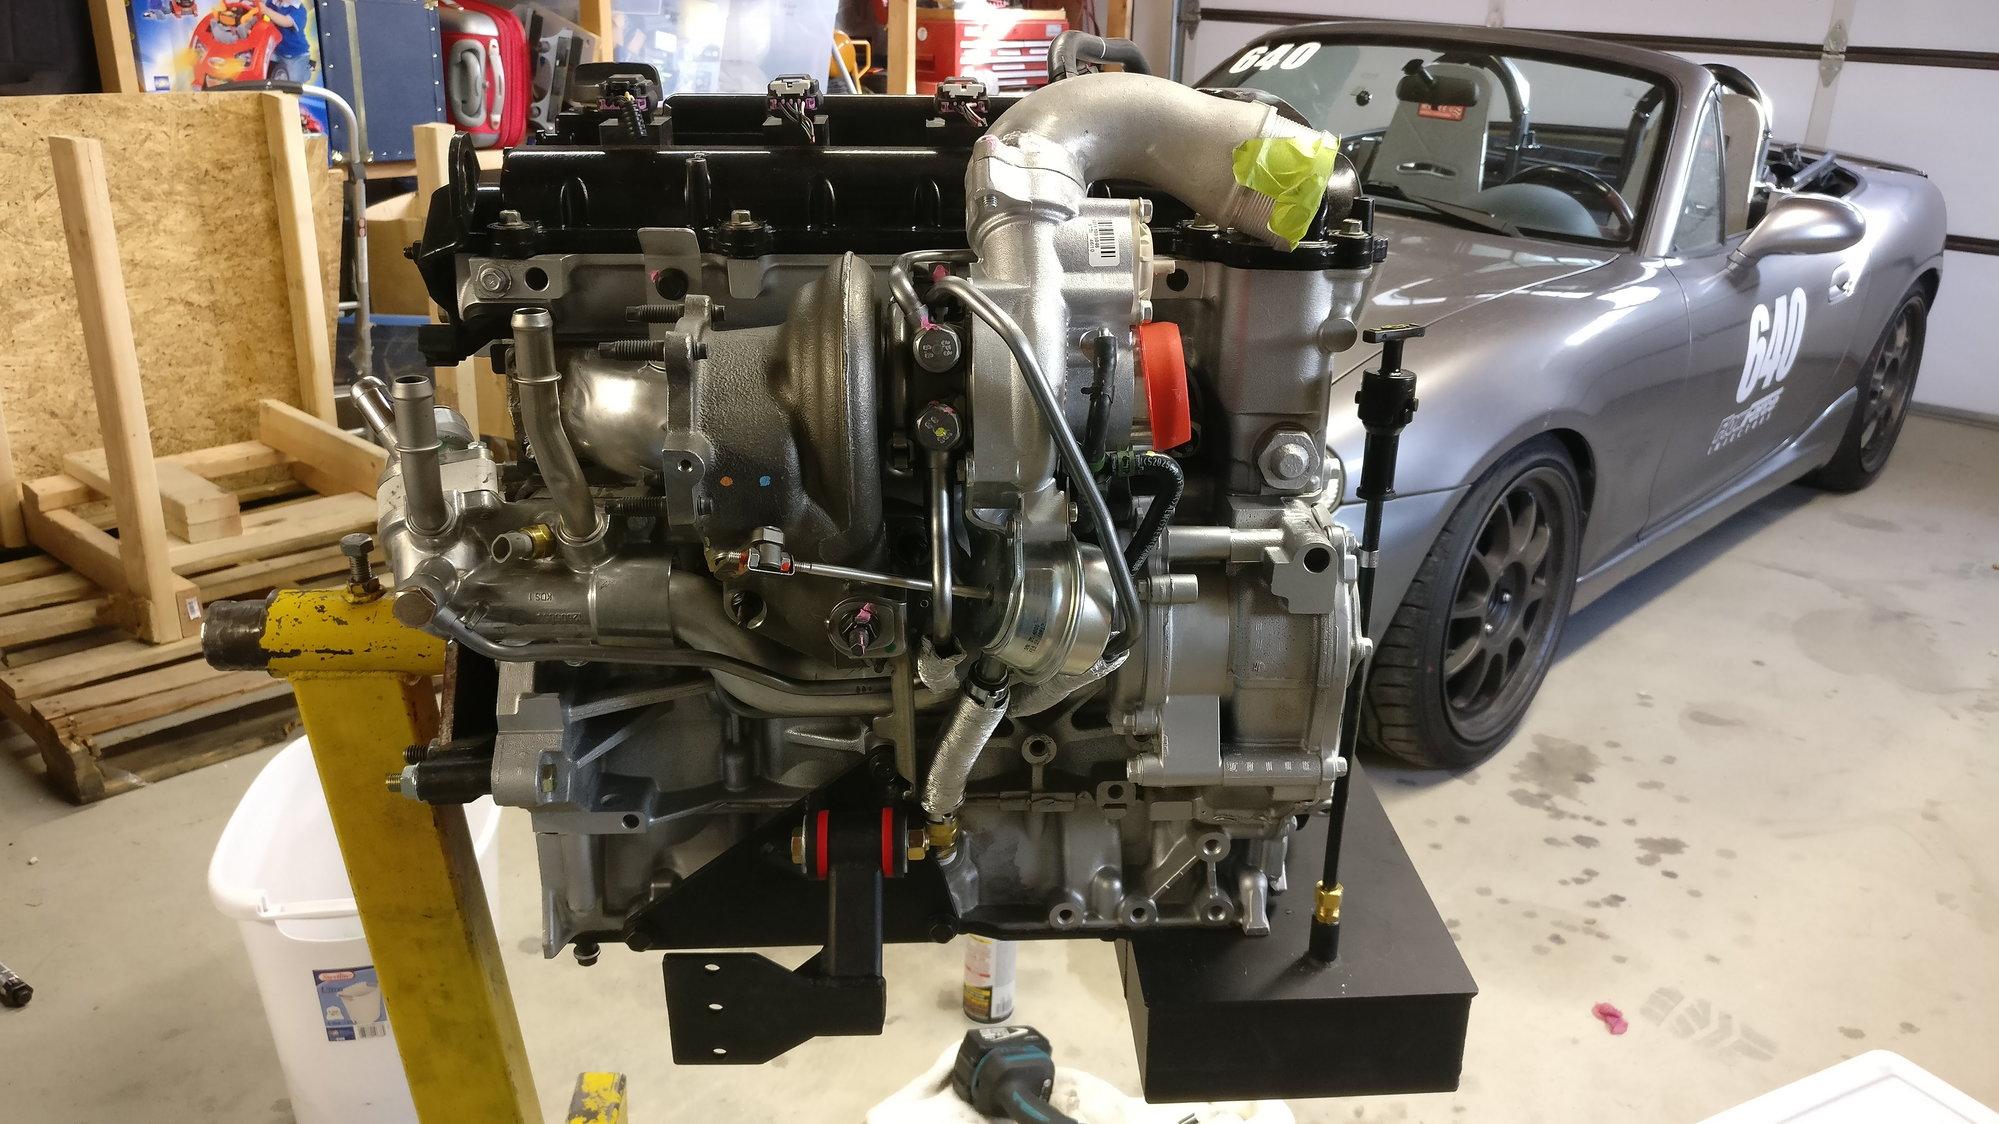 nigelt gets bored and adds displacement (ecotec turbo build) - Miata